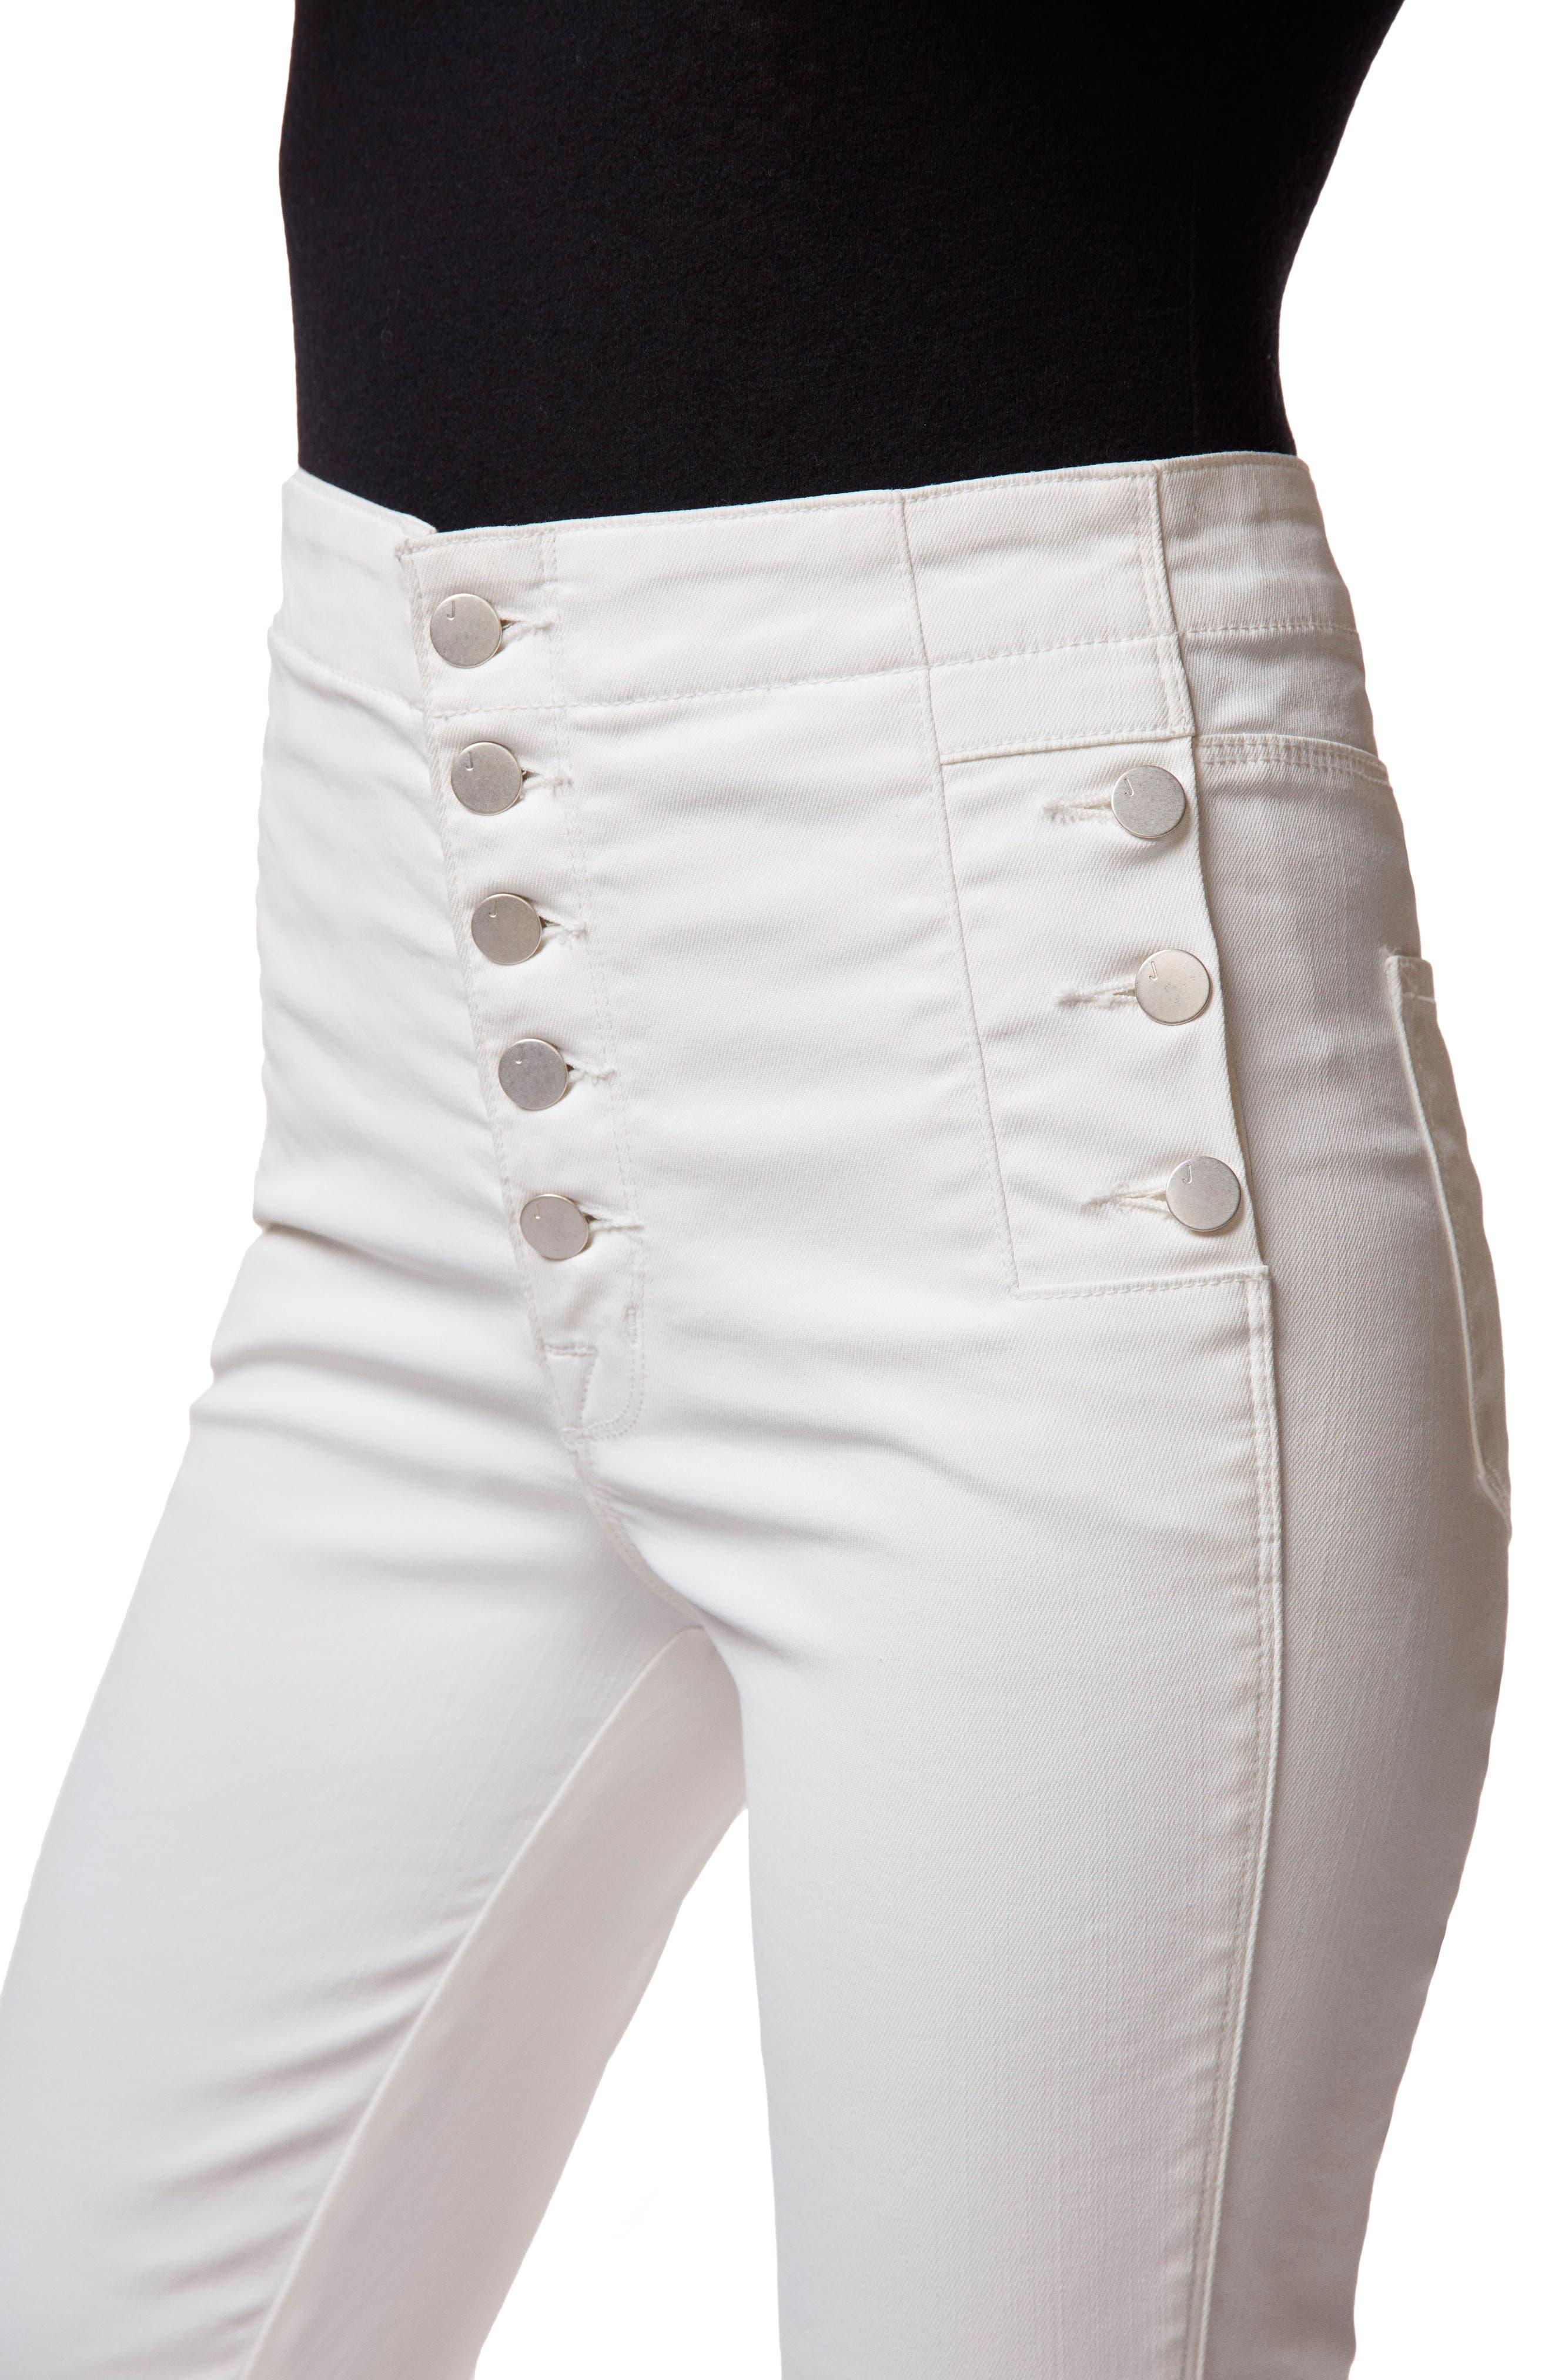 Natasha Sky High Coated Super Skinny Jeans,                             Alternate thumbnail 4, color,                             105